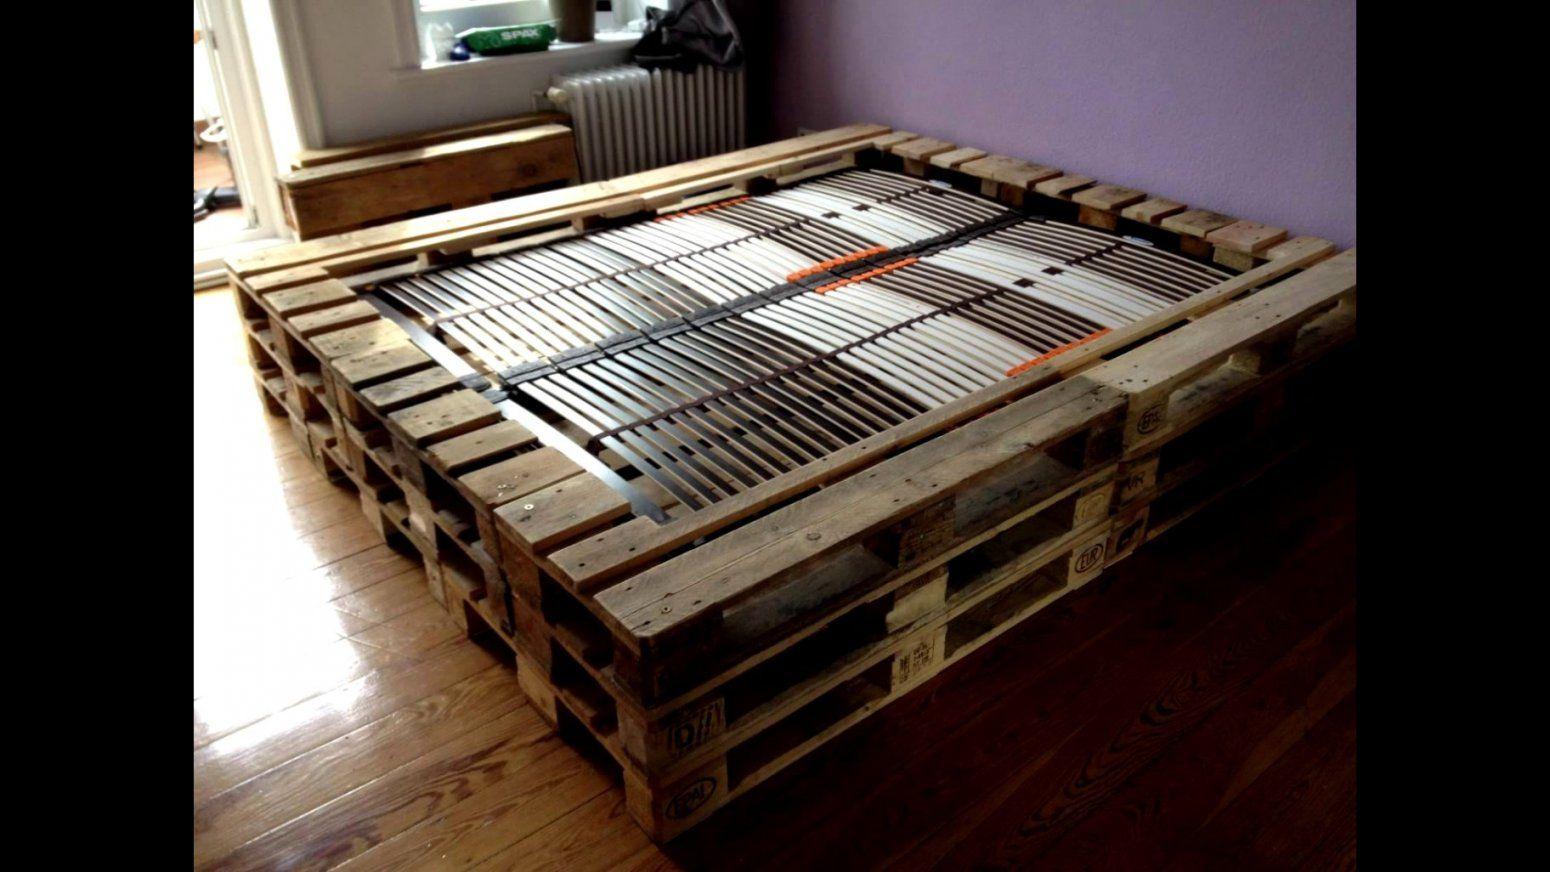 Luxuriös Doppelbett Aus Europaletten Zum Bett Selber Bauen Anleitung von Bett Selber Bauen Anleitung 180X200 Bild